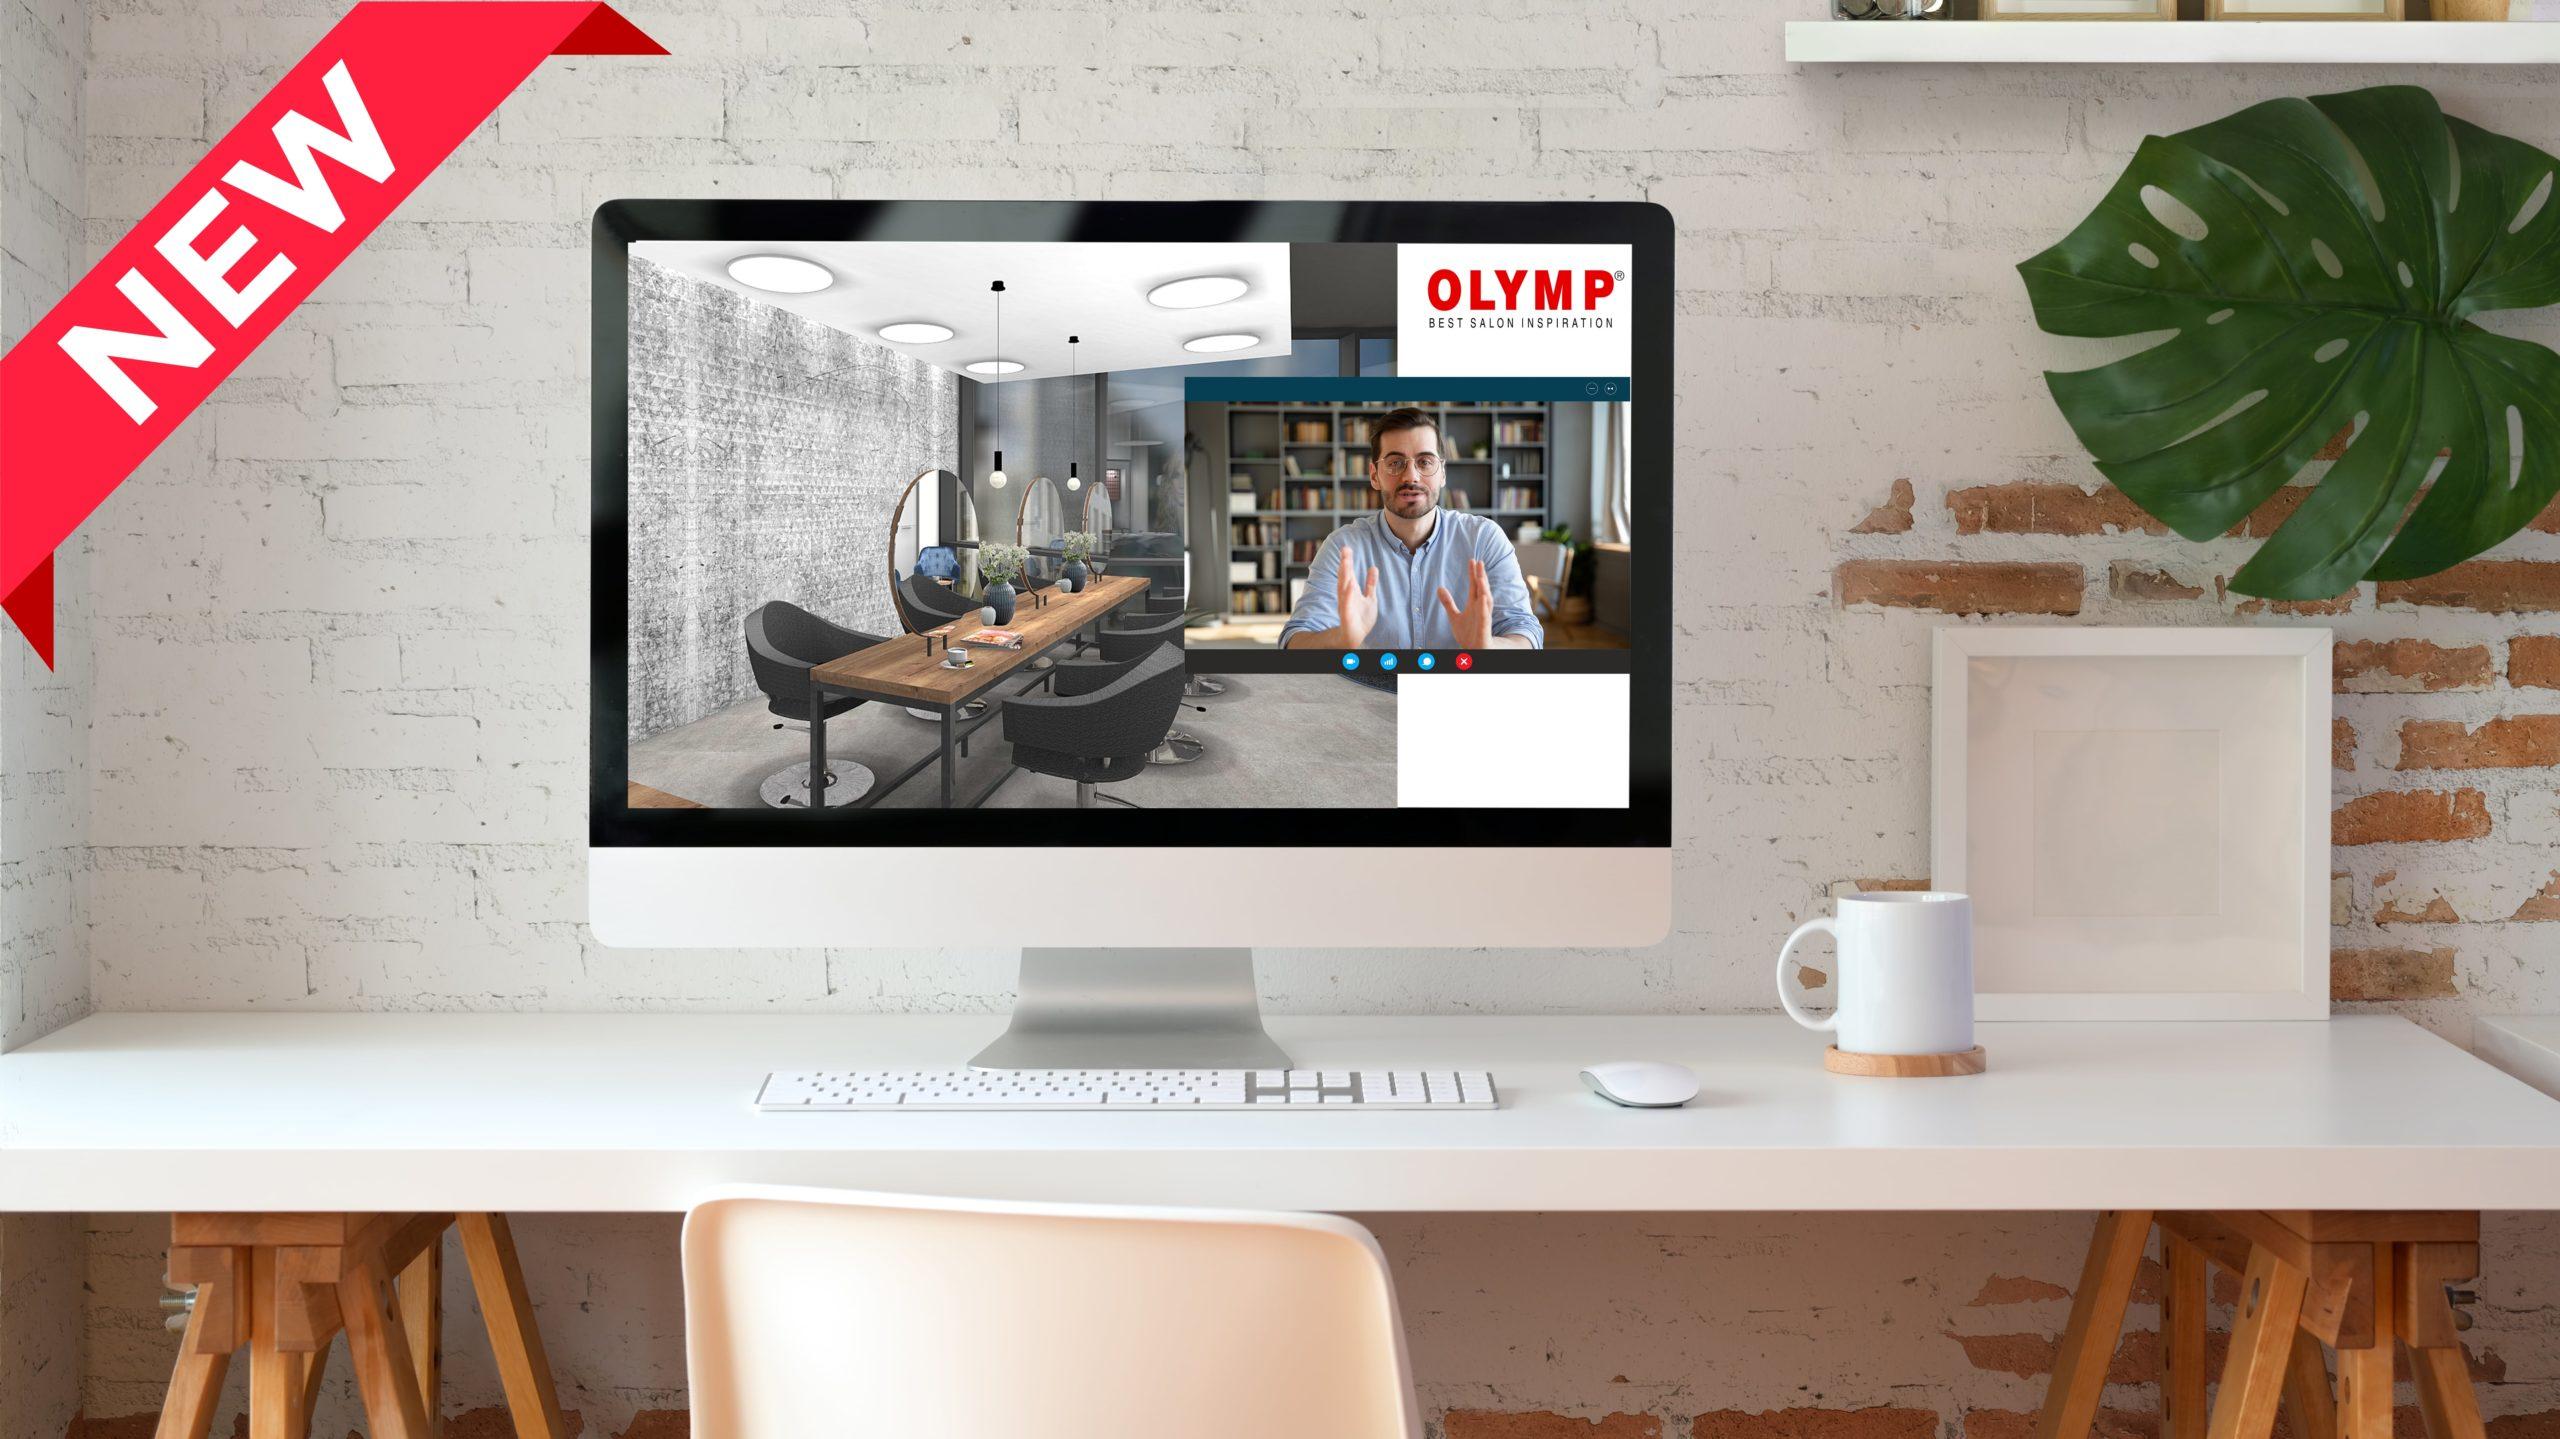 Olymp Online-Beratung